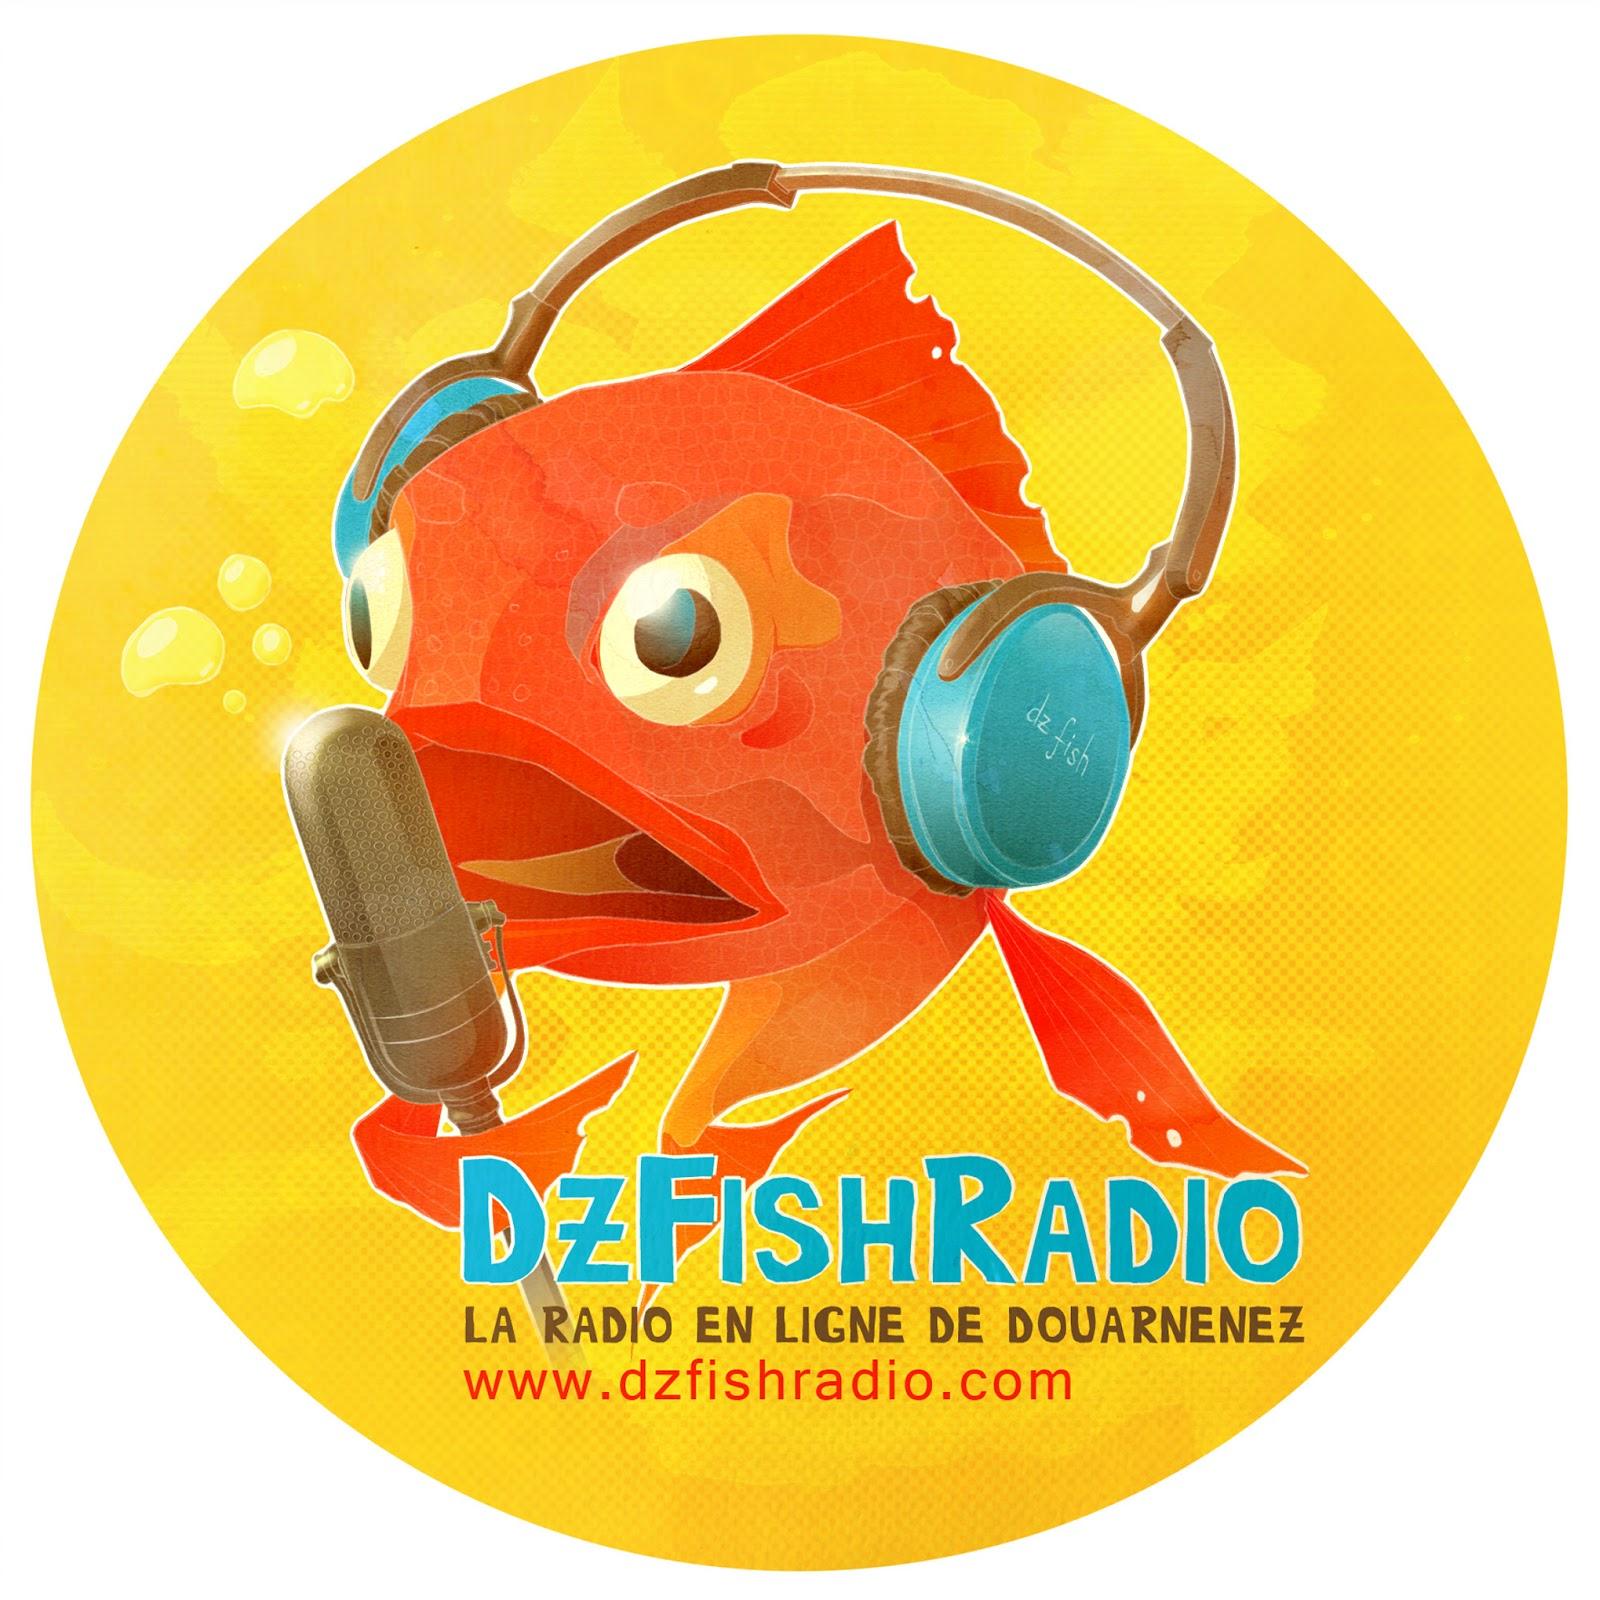 http://www.dzfishradio.com/